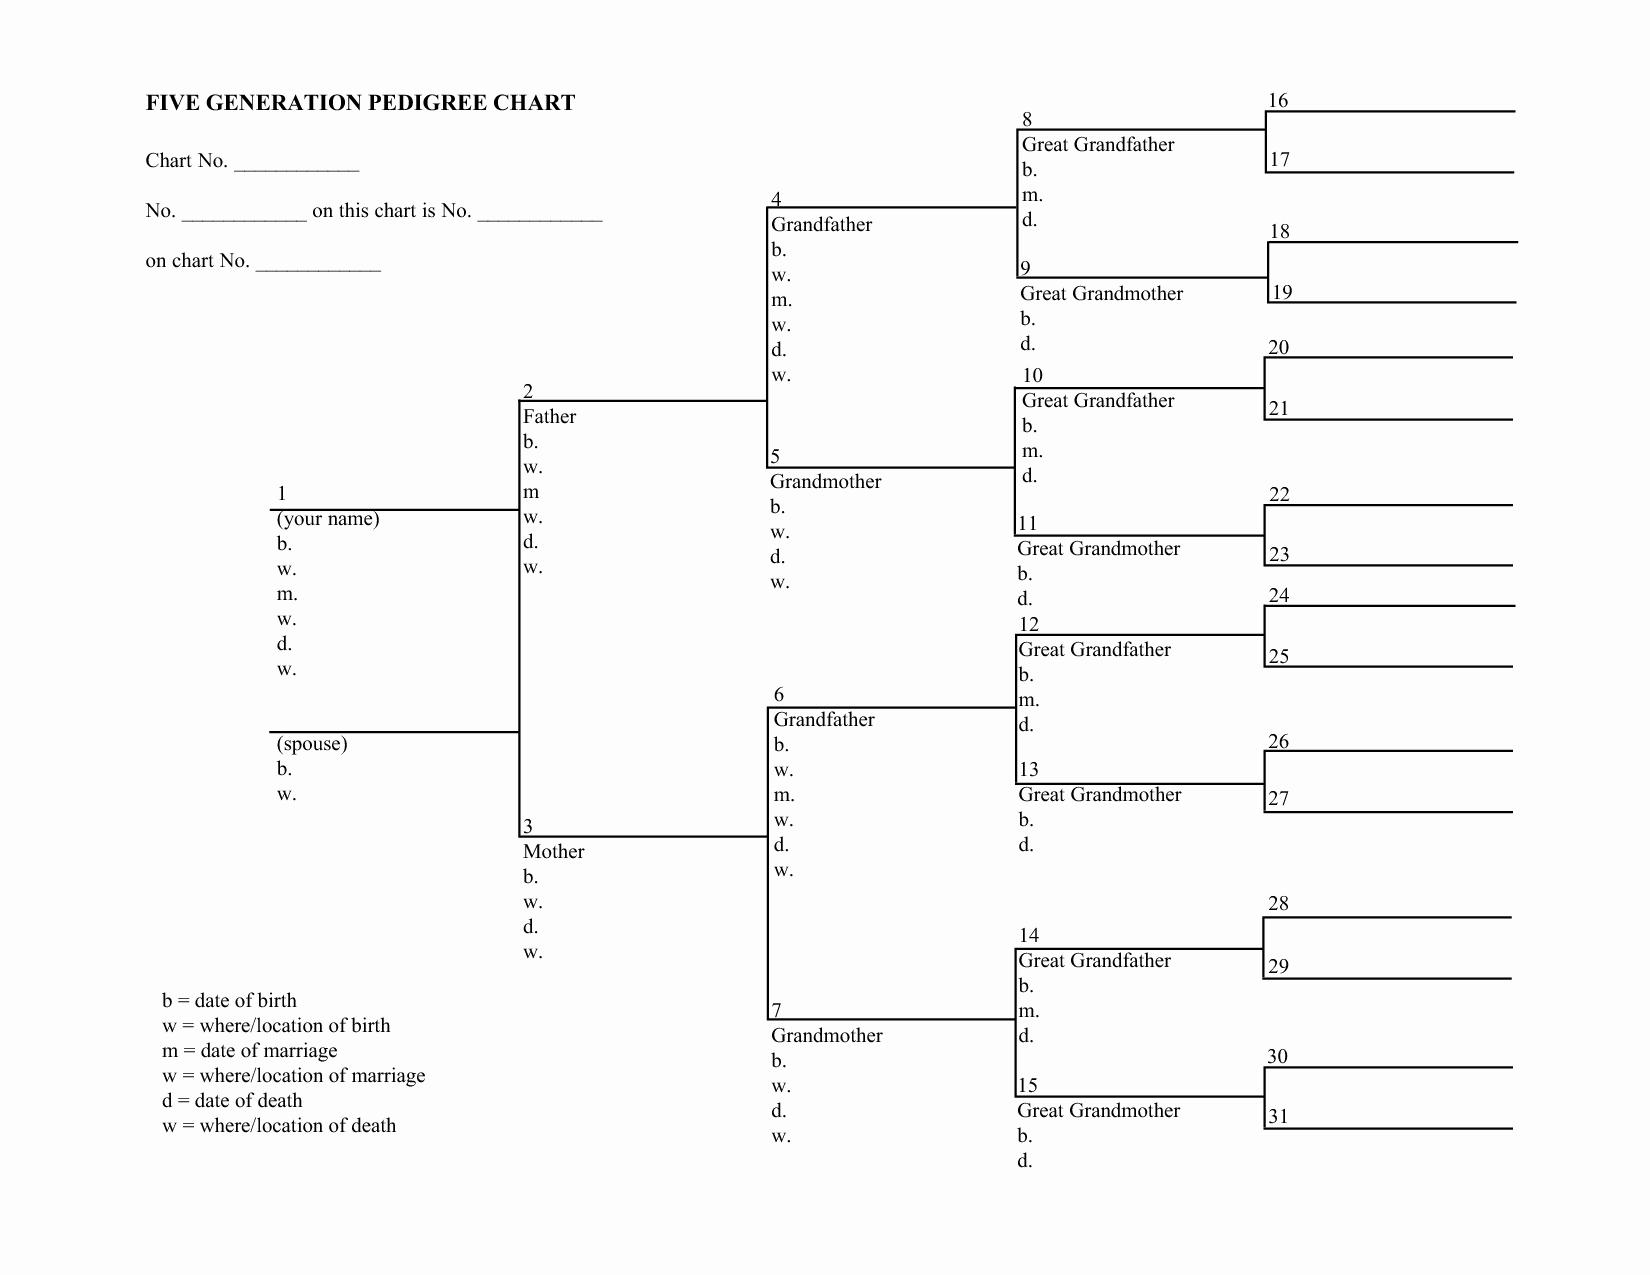 Family Tree Template 5 Generations Elegant 12 Best Of Family Tree Pedigree Chart Worksheet 6